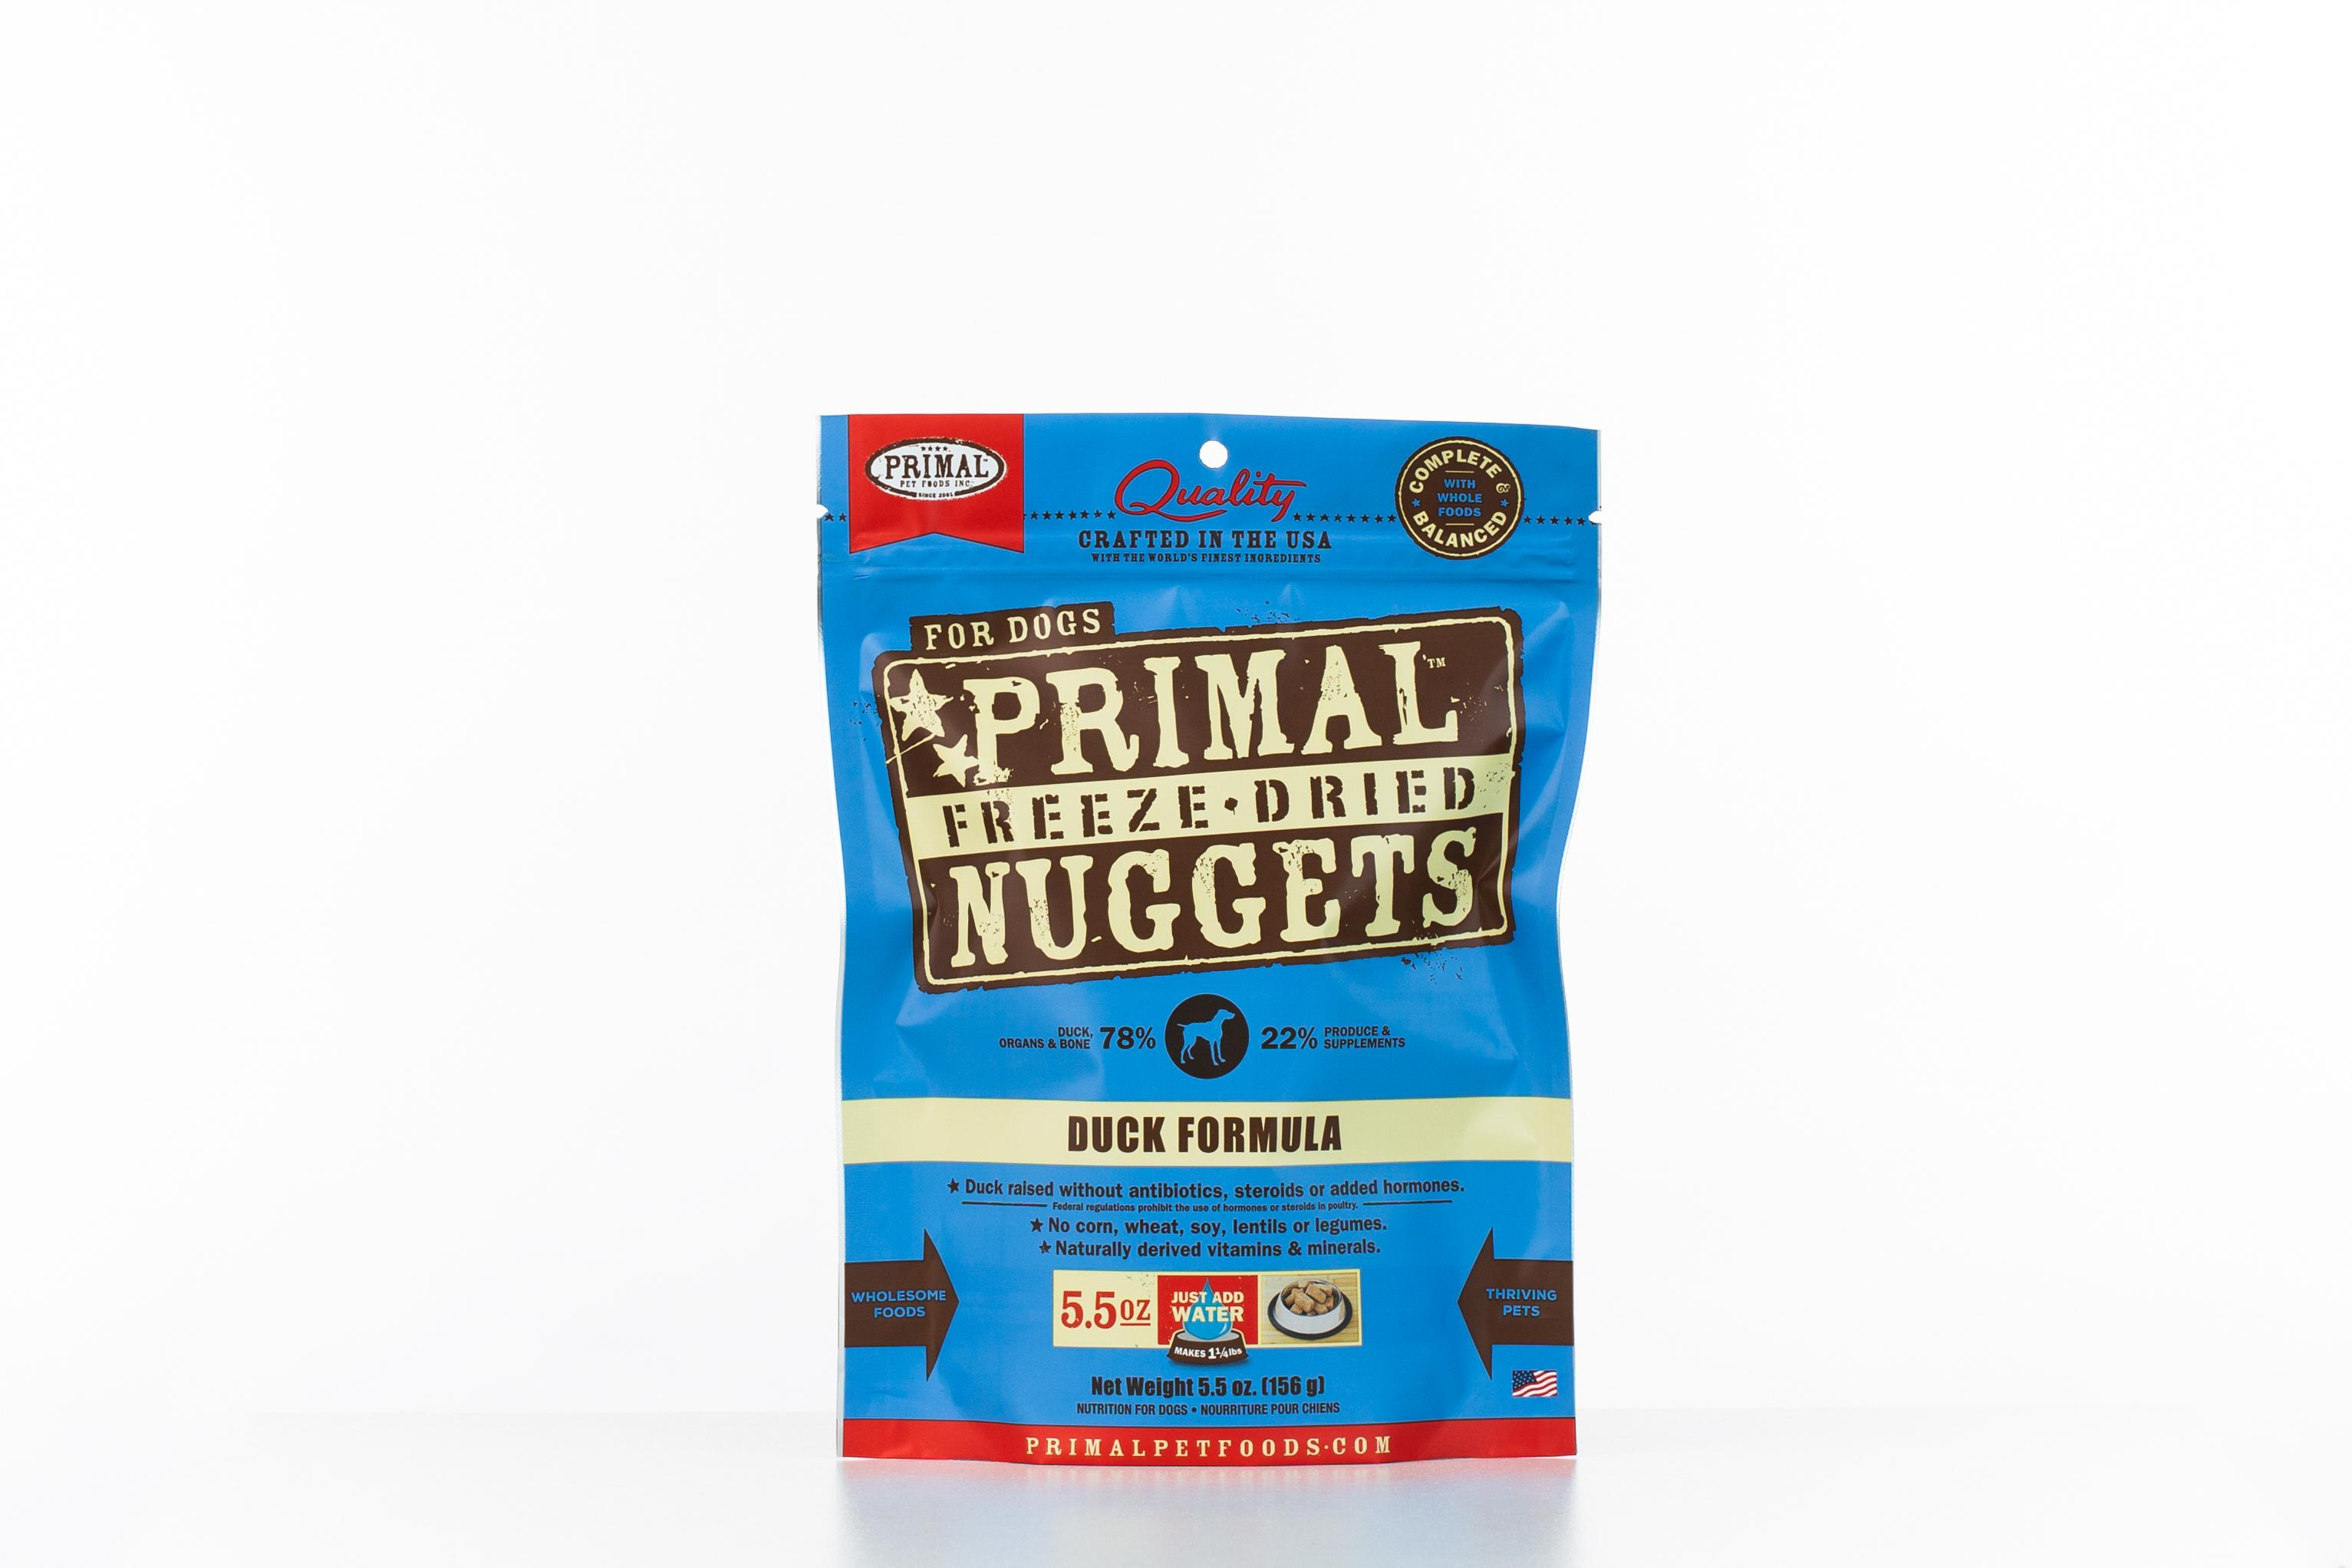 Primal Duck Formula Nuggets Grain-Free Raw Freeze-Dried Dog Food, 5.5-oz bag